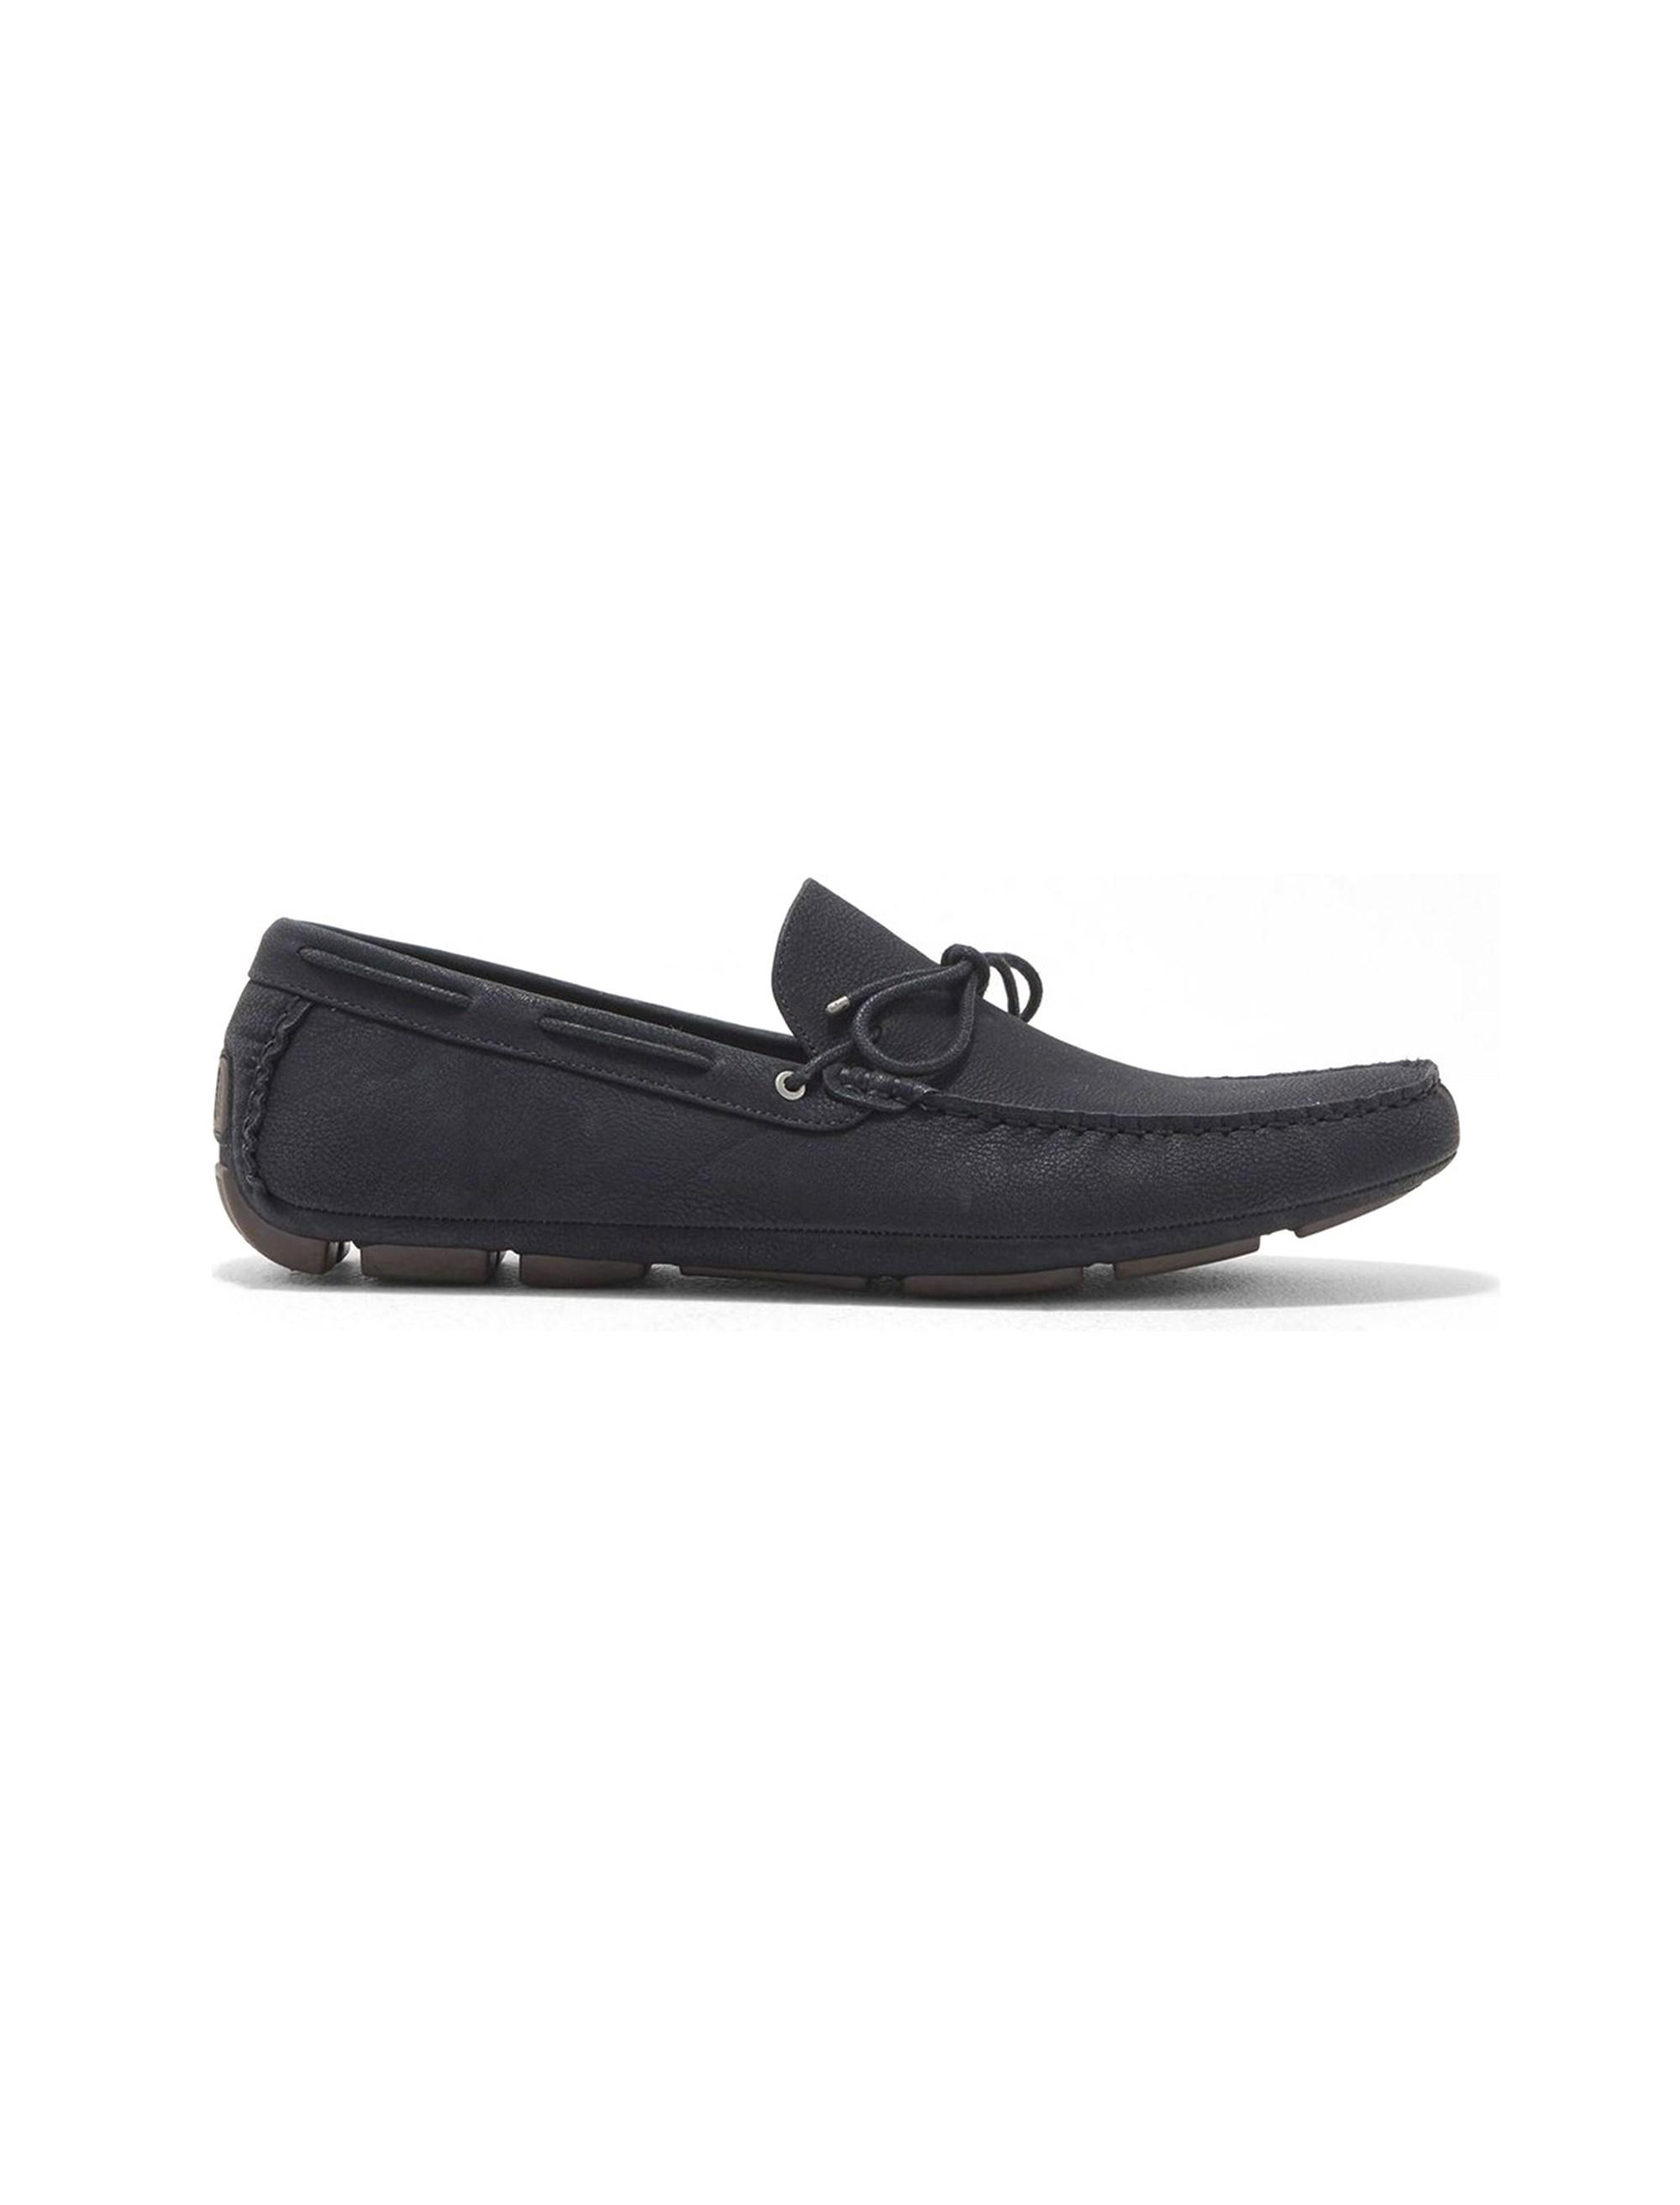 کفش راحتی مردانه Breuer - کال ایت اسپرینگ